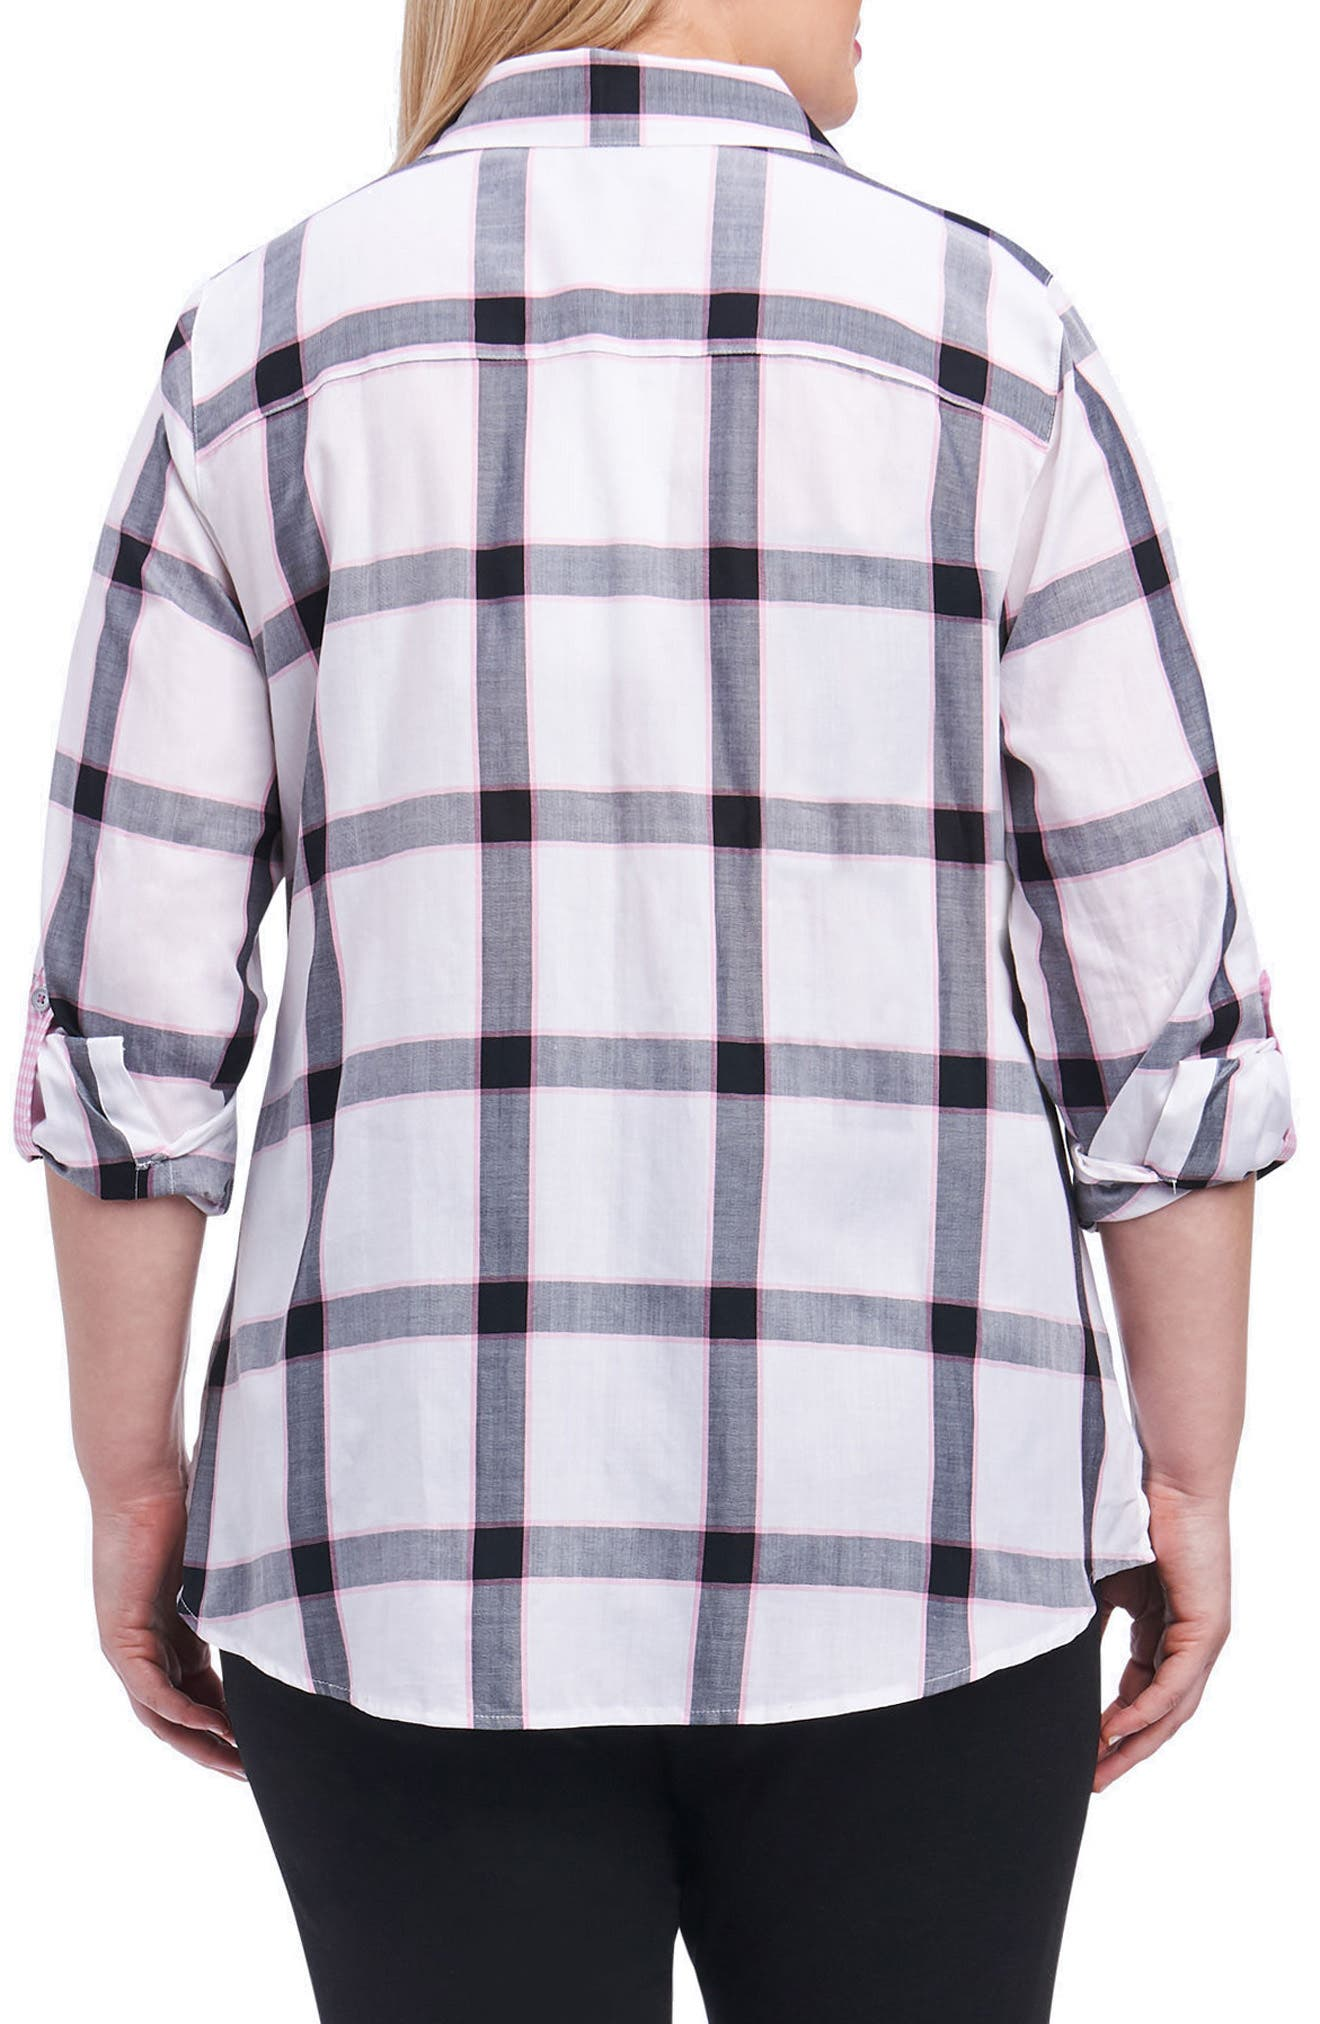 Zoey Herringbone Plaid Shirt,                             Alternate thumbnail 2, color,